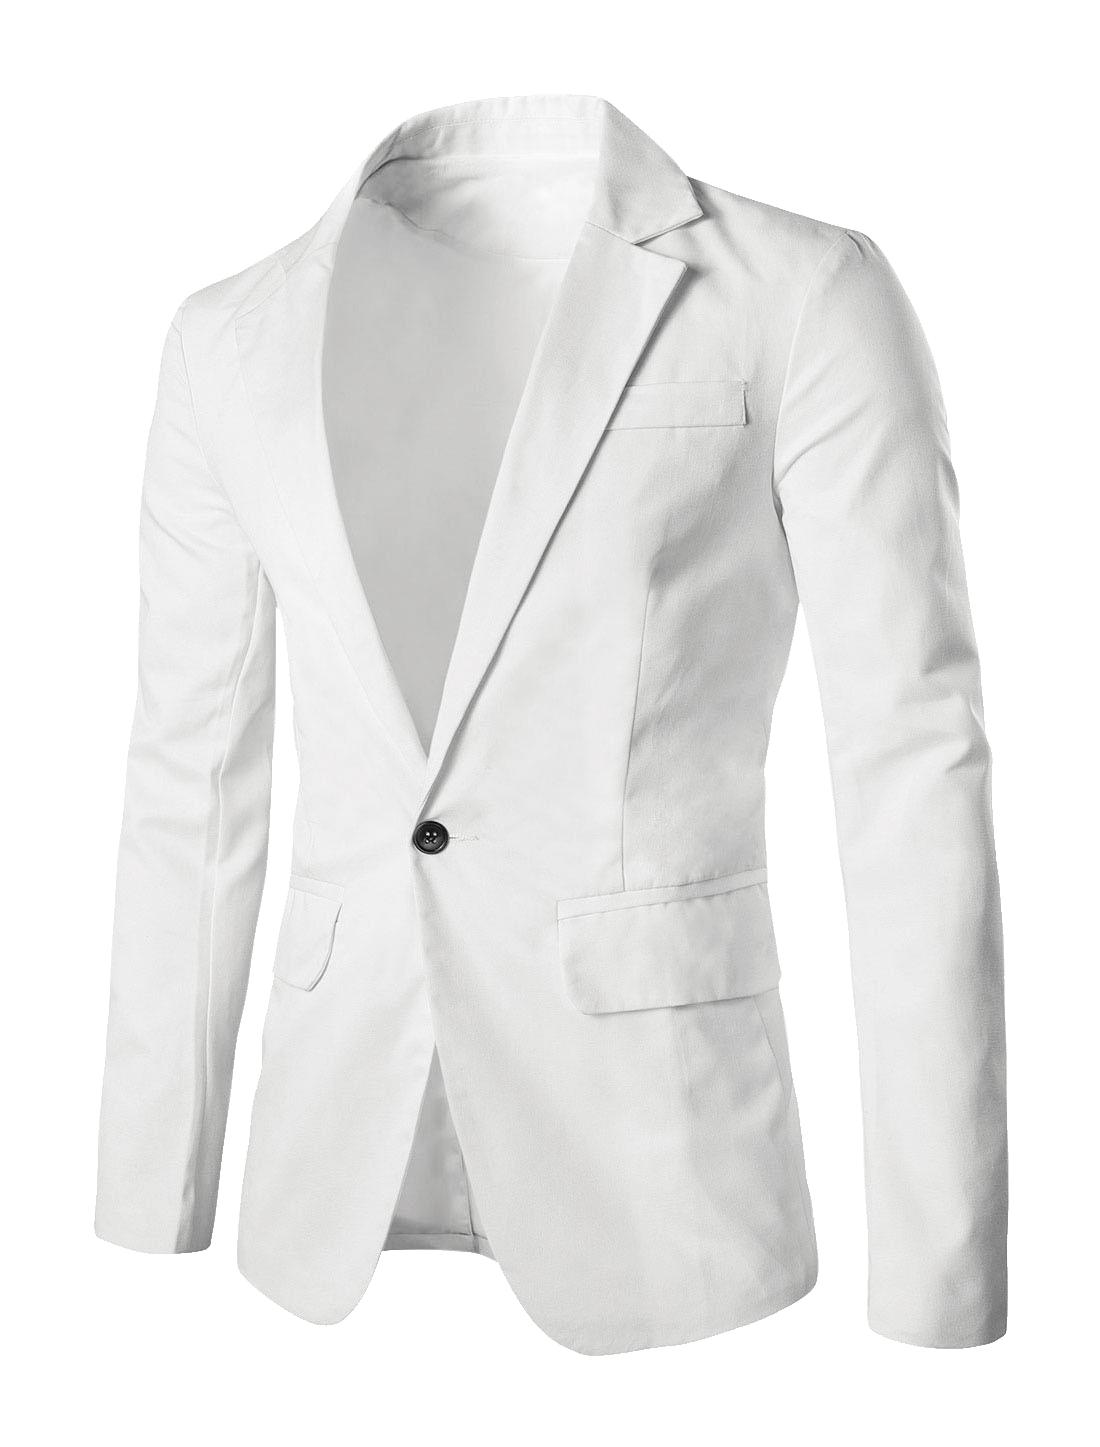 Men Notched Lapel Center-Vent Back Button Closed Casual Blazer White L